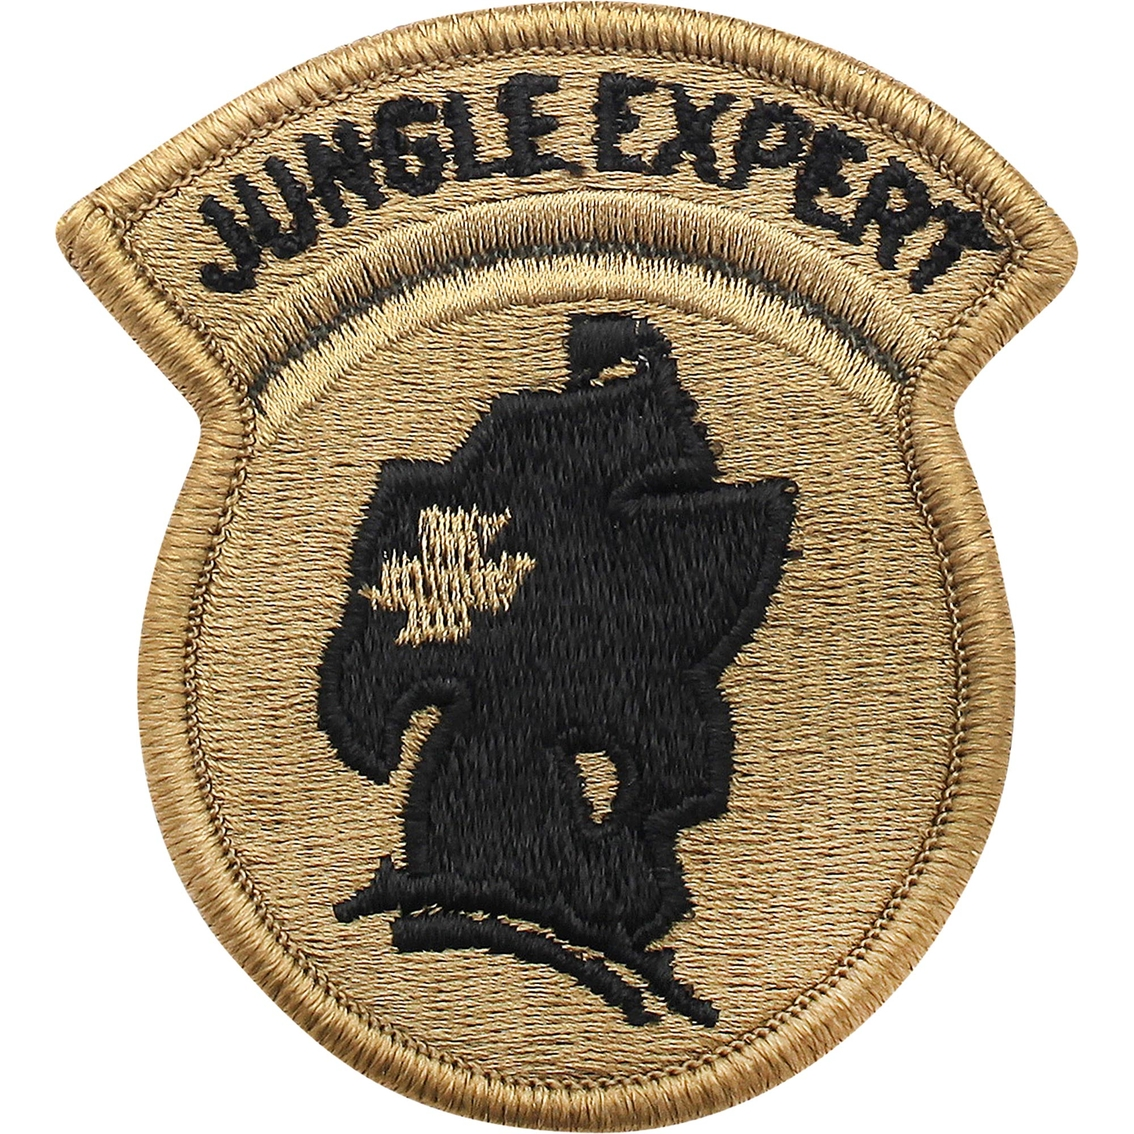 Army Patch Jungle Expert Subdued Velcro (ocp) | Ocp Unit